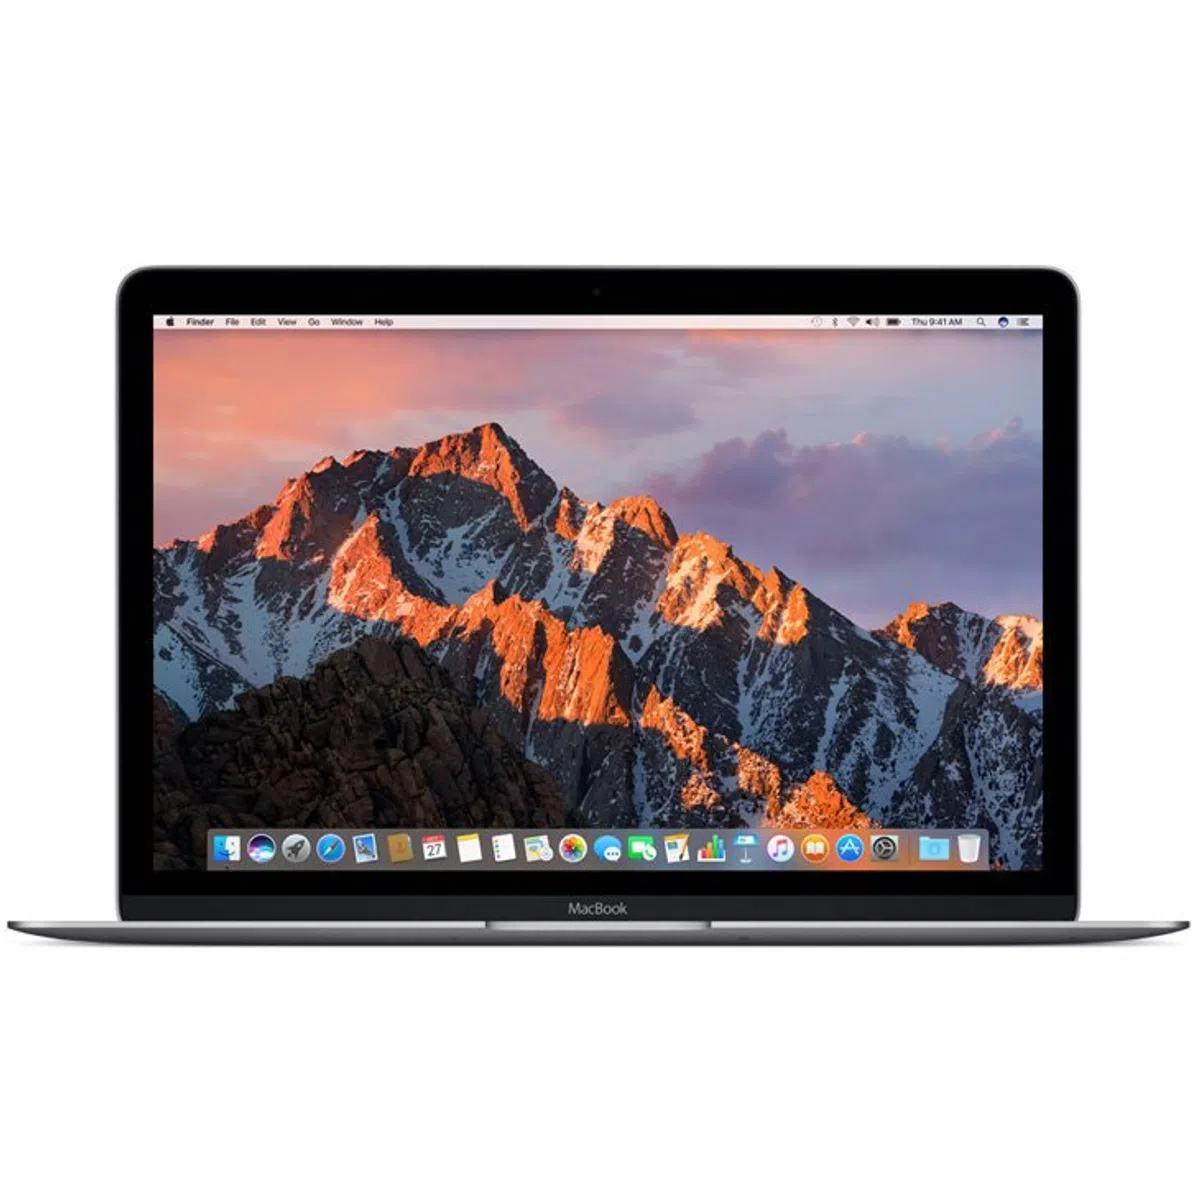 Macbook - Apple Mlh82bz/a Core M 1.20ghz 8gb 512gb Ssd Intel Hd Graphics 515 os X El Capitan 12'' Polegadas